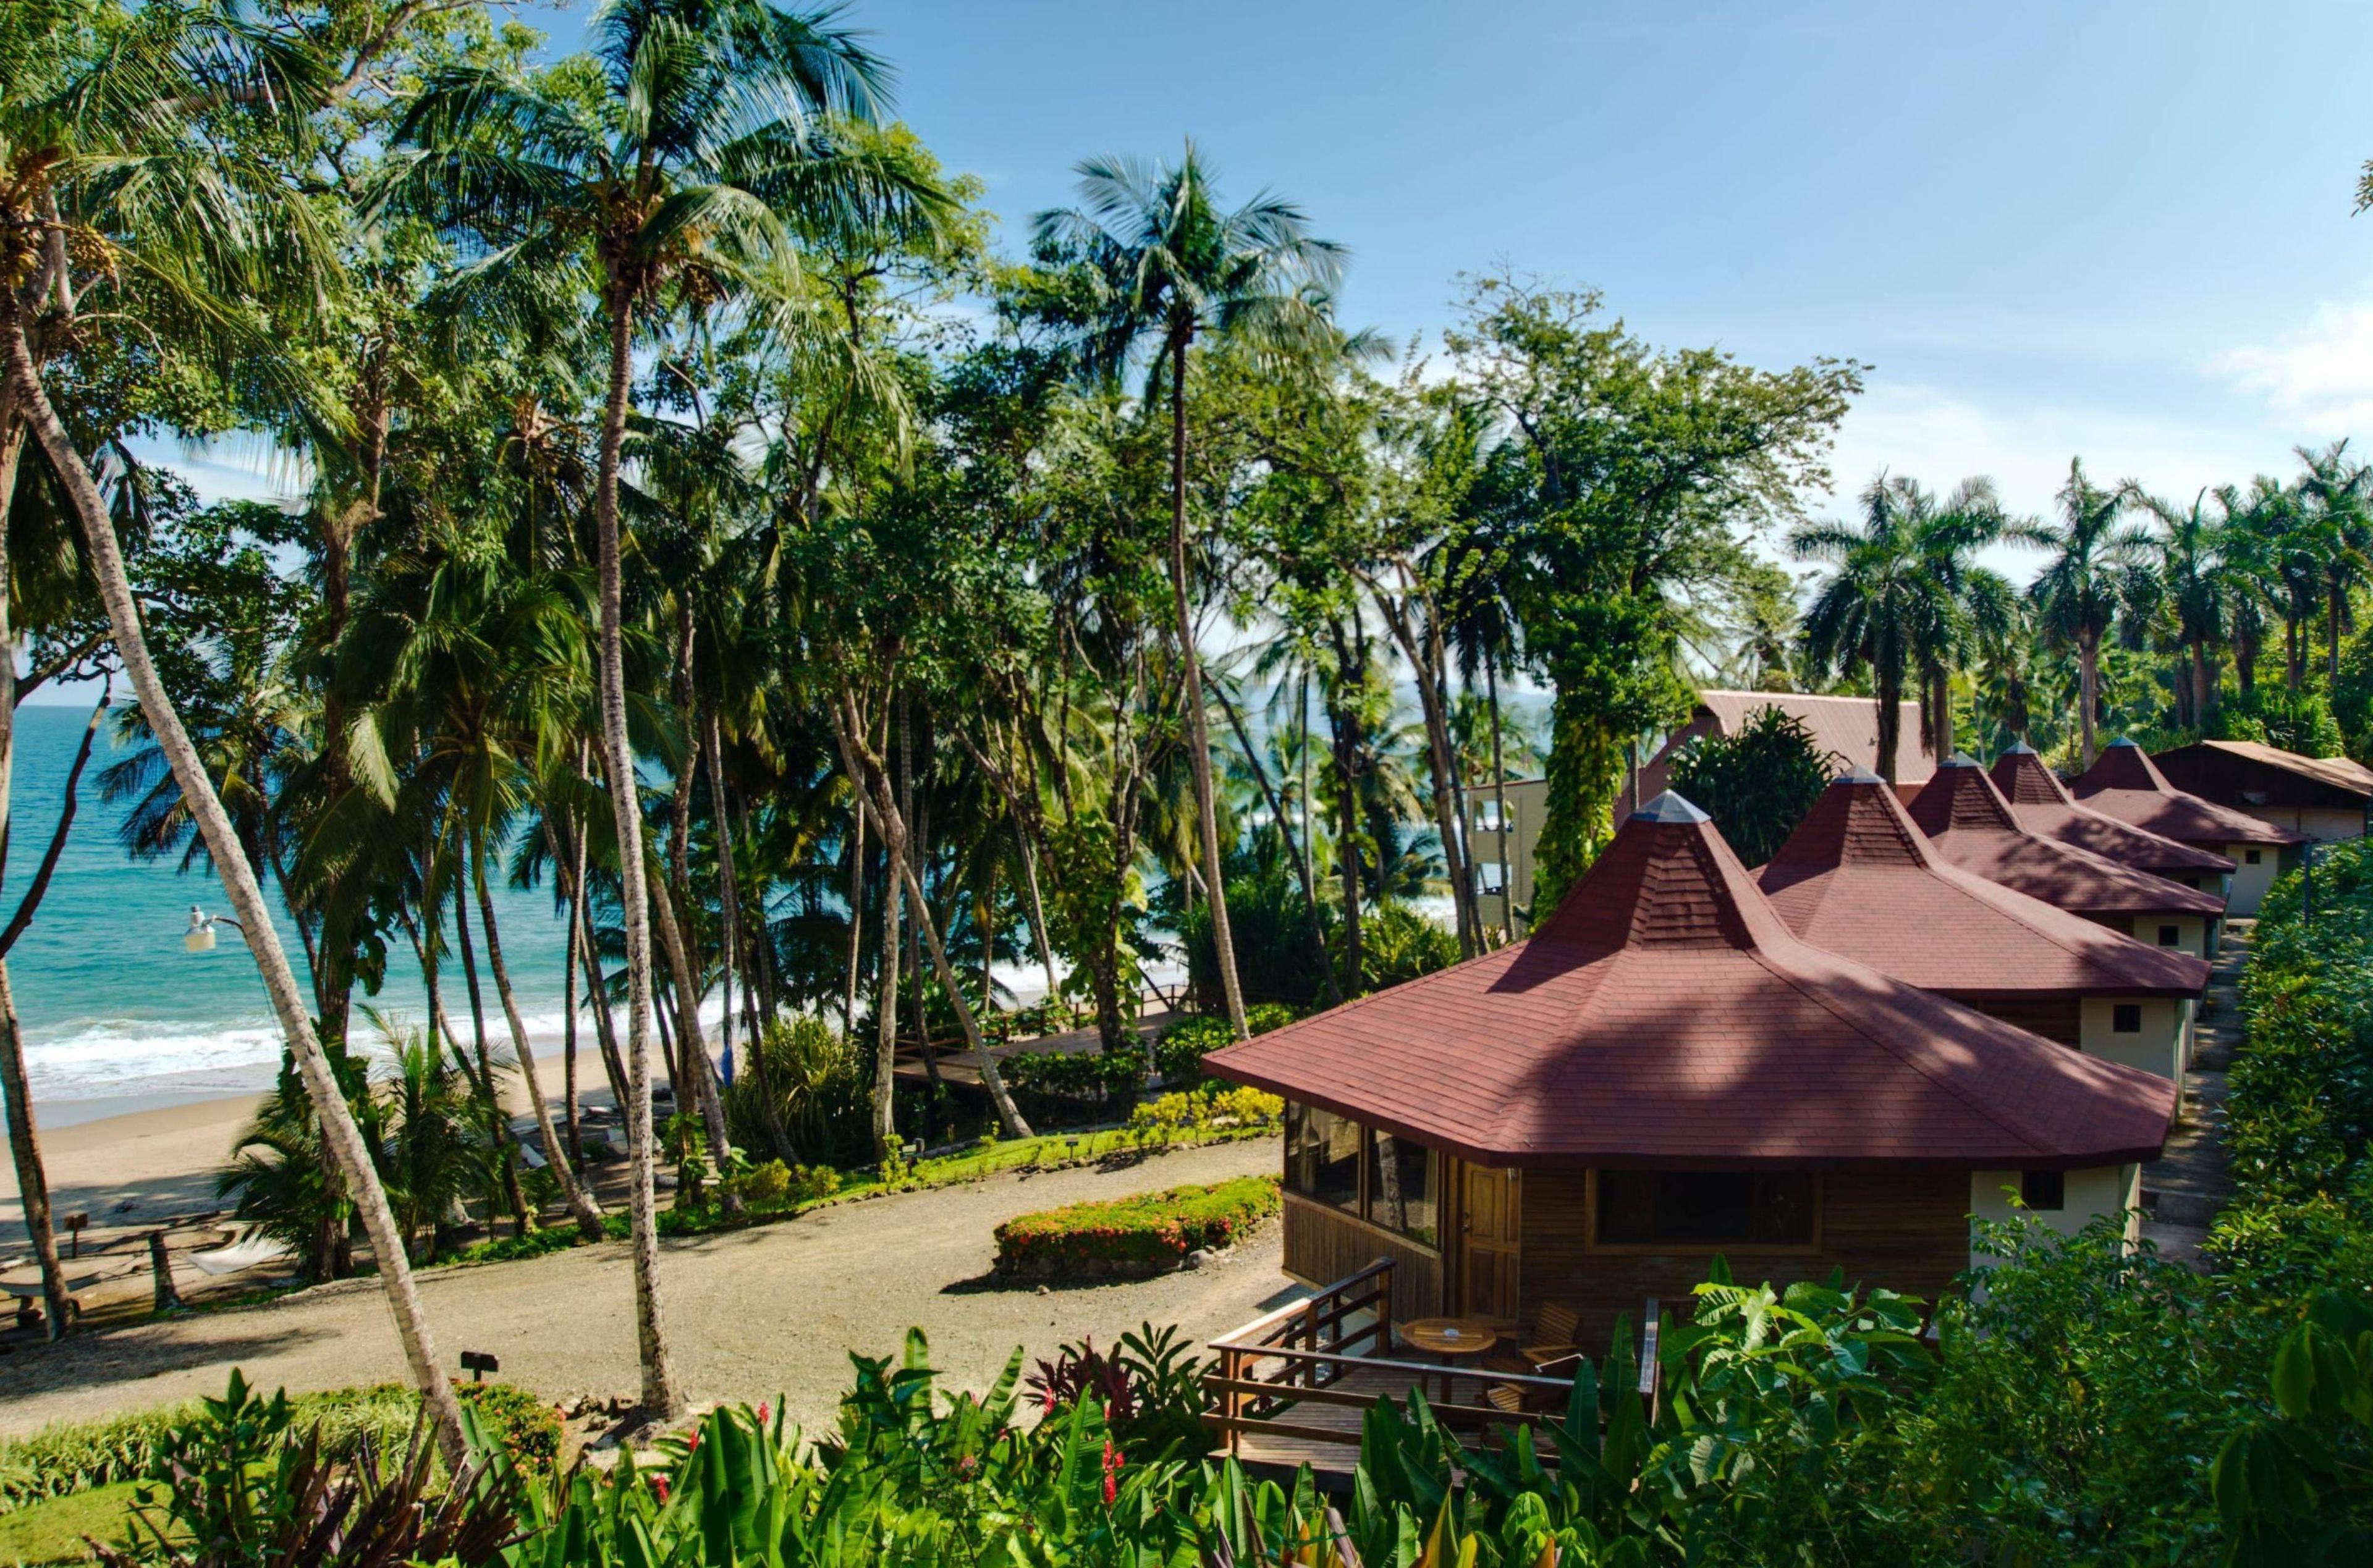 Courtesy of Tango Mar Beachfront Boutique Hotel & Villas / Expedia.com